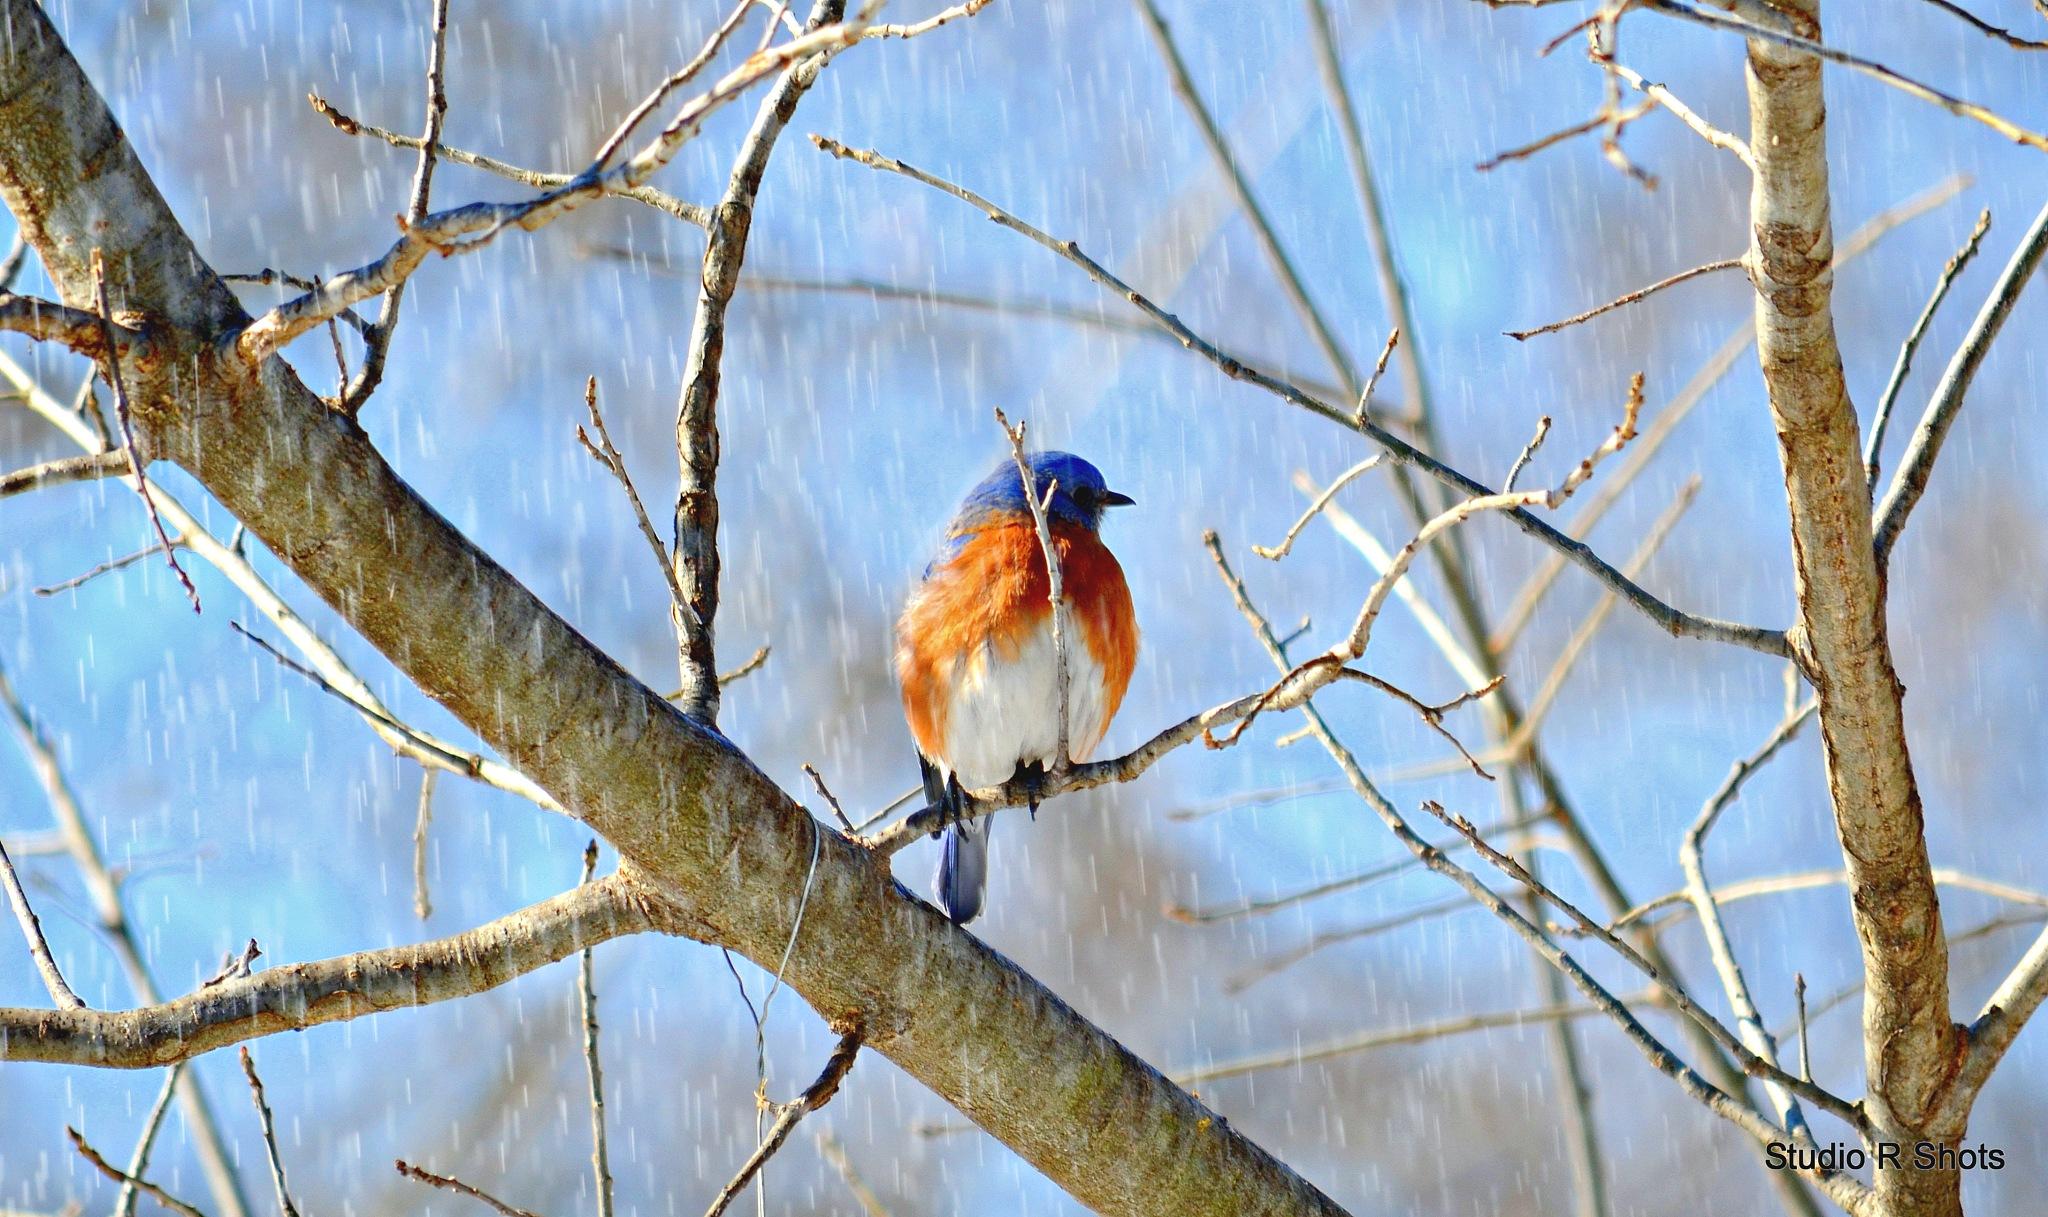 Puffy bluebird by Angie Peters Reszinski